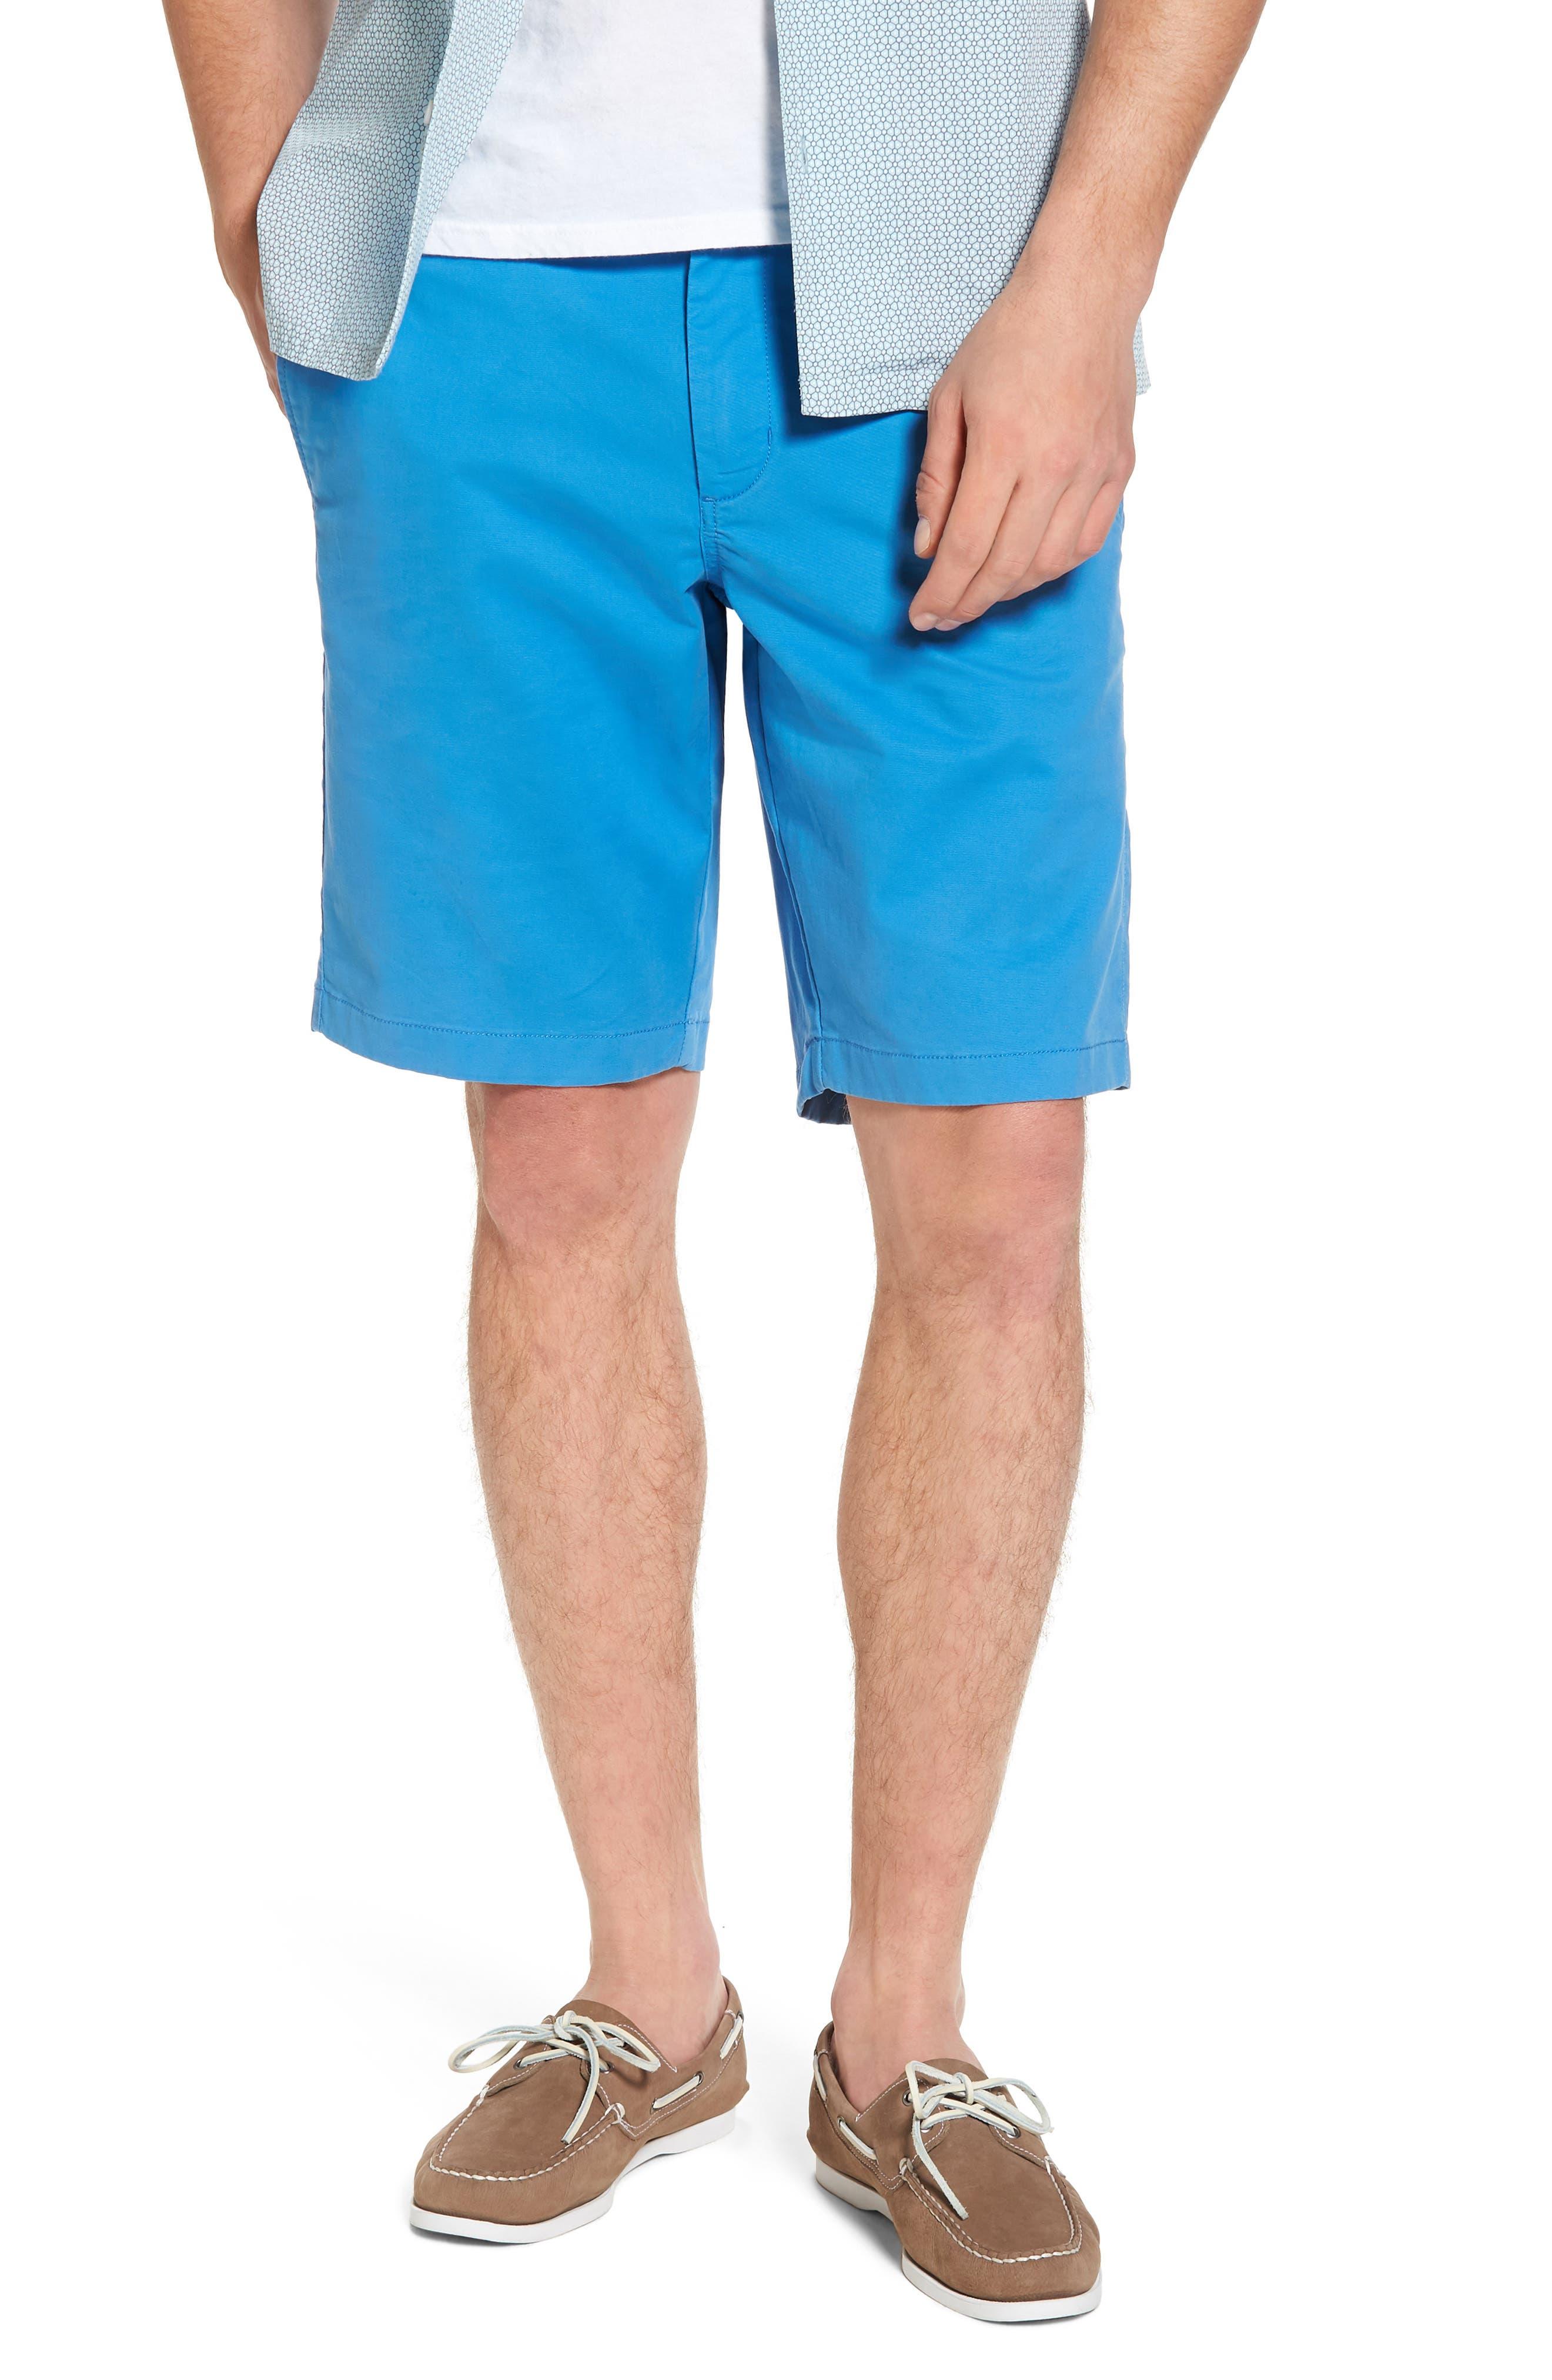 Ballard Slim Fit Stretch Chino 11-Inch Shorts,                         Main,                         color, Blue Camp